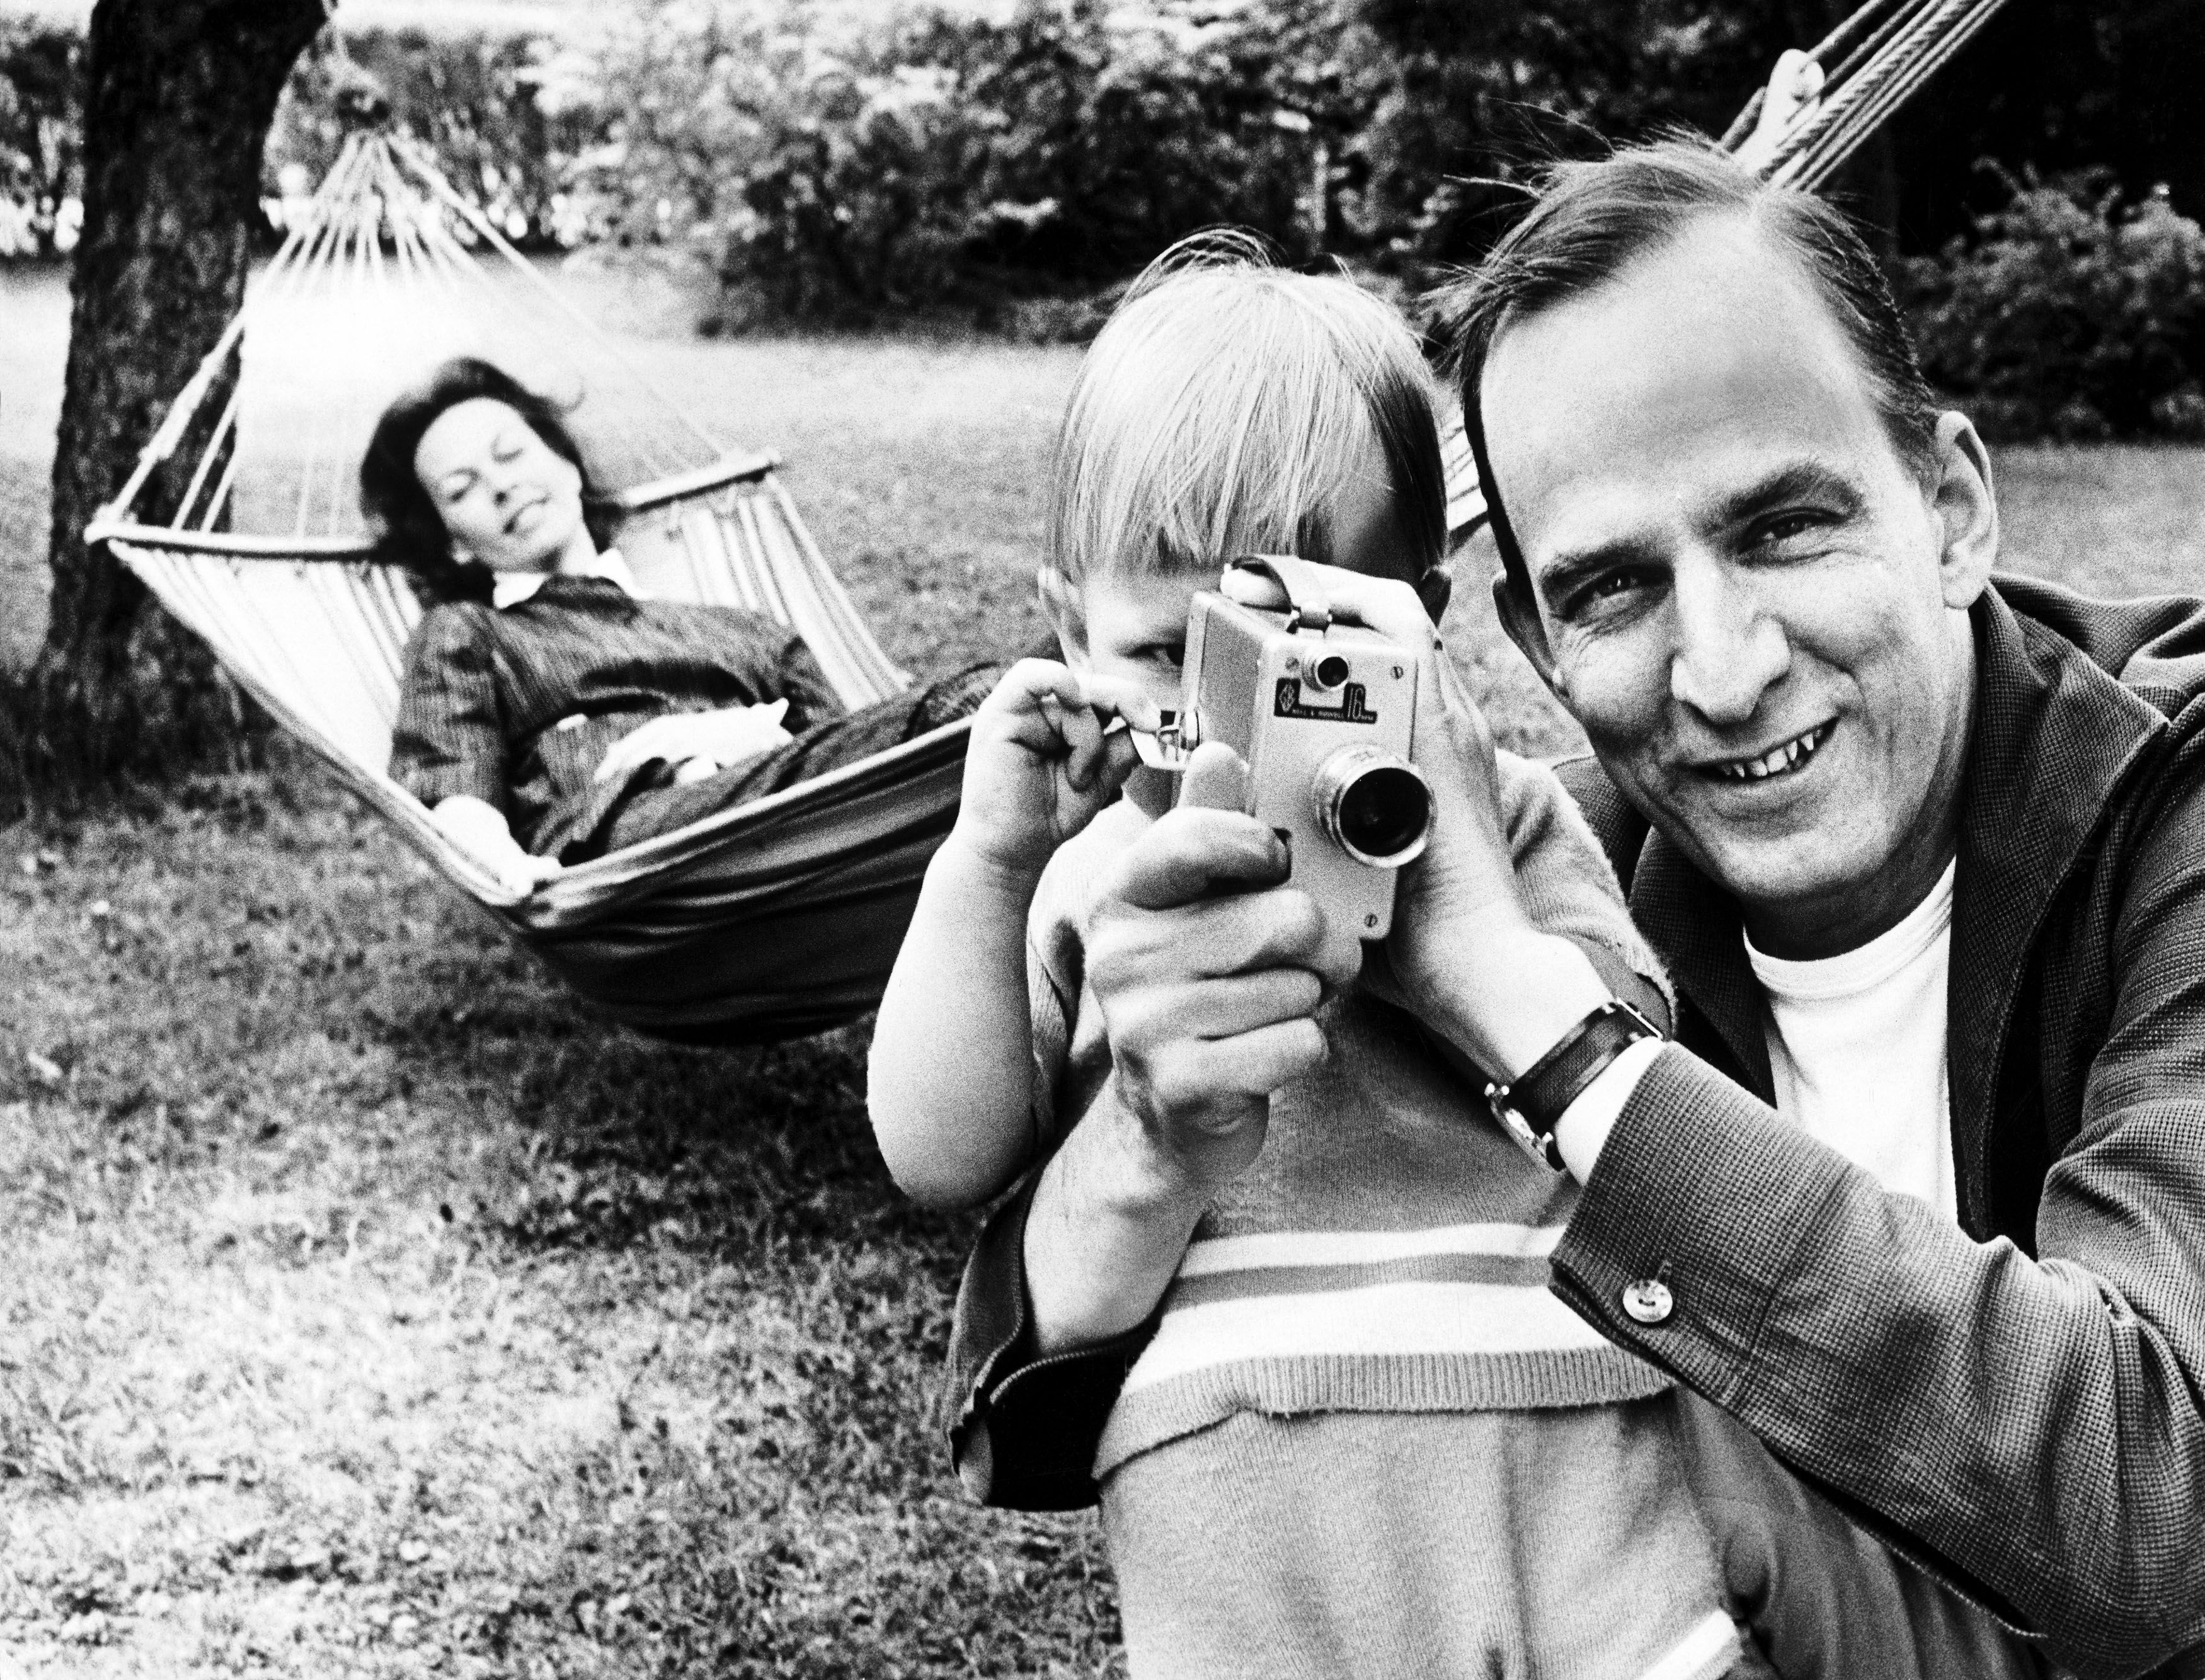 ingmar bergman swedish film director with family